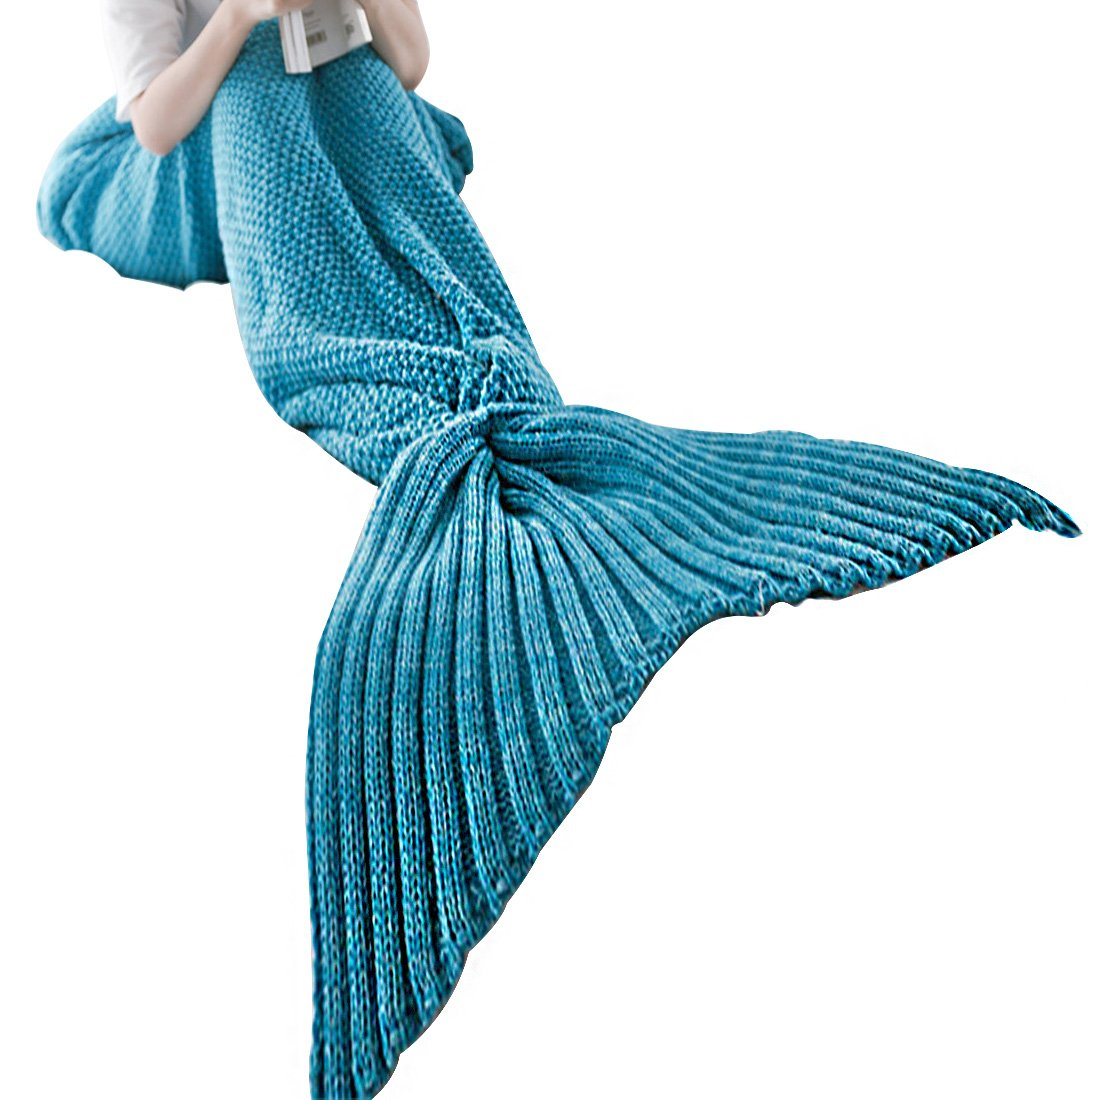 Vonty Mermaid Blanket,Mermaid Tail Blanket for Baby, All Seasons Sofa Sleeping Bag Sleeping Blankets for Baby Photo Photography,19''x35'',Light Blue